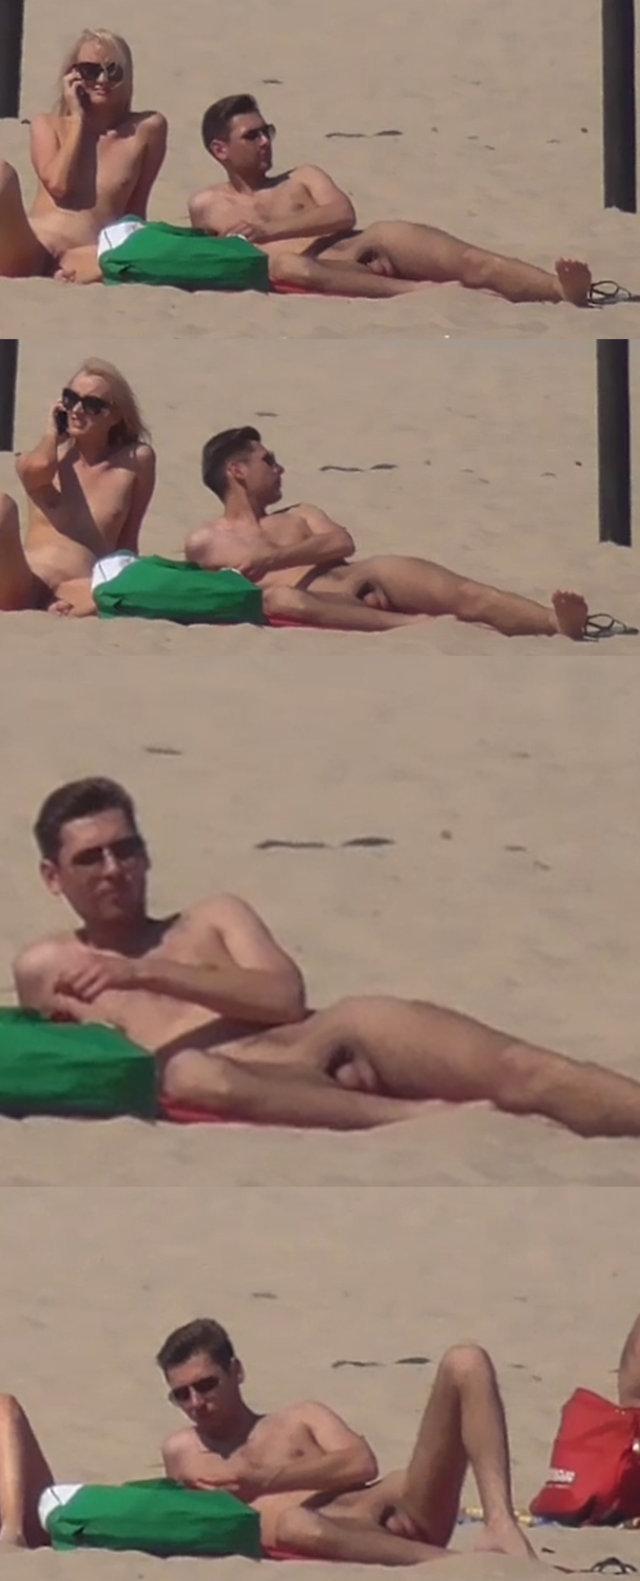 straight nudist guy sunbathing naked with girlfriend